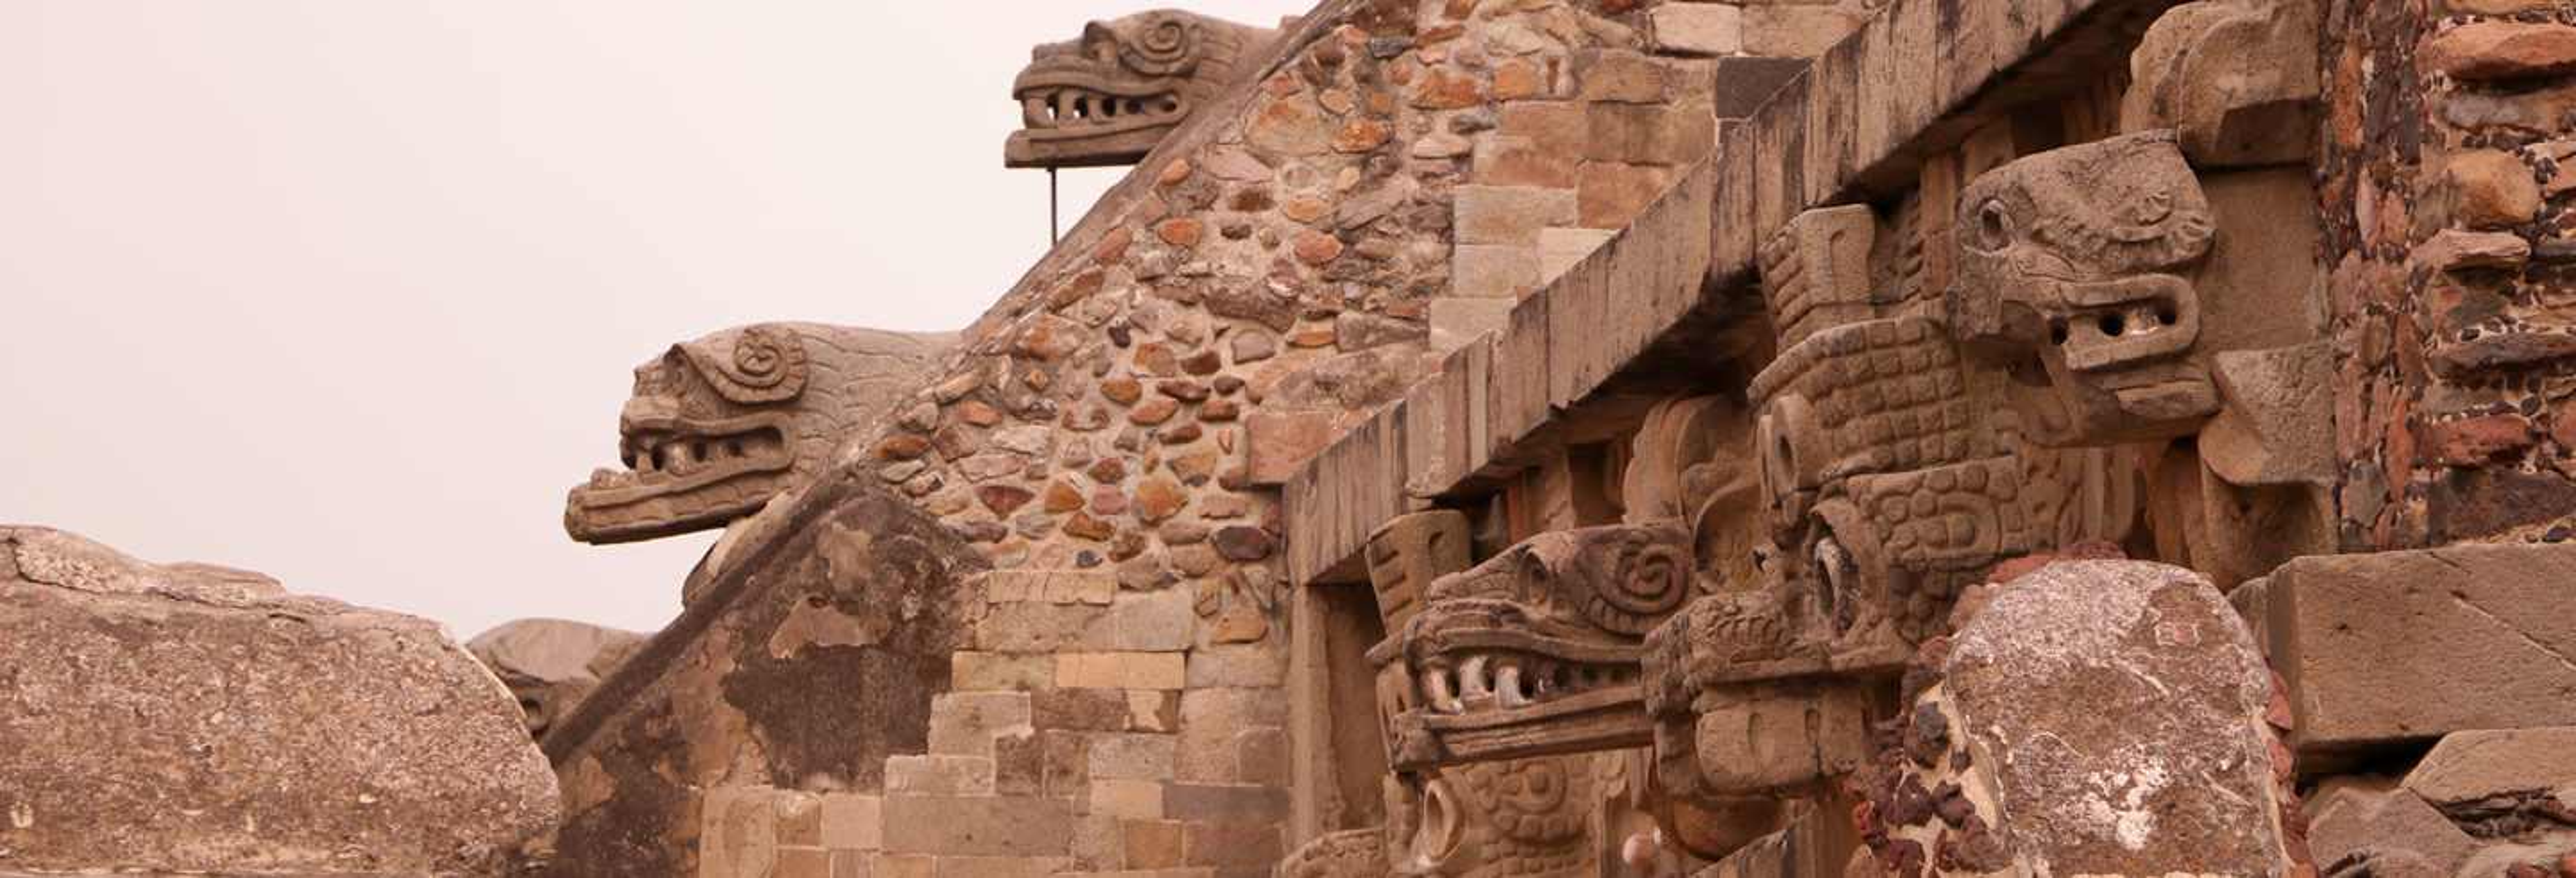 Tour privado por Teotihuacán ¡Tú eliges!